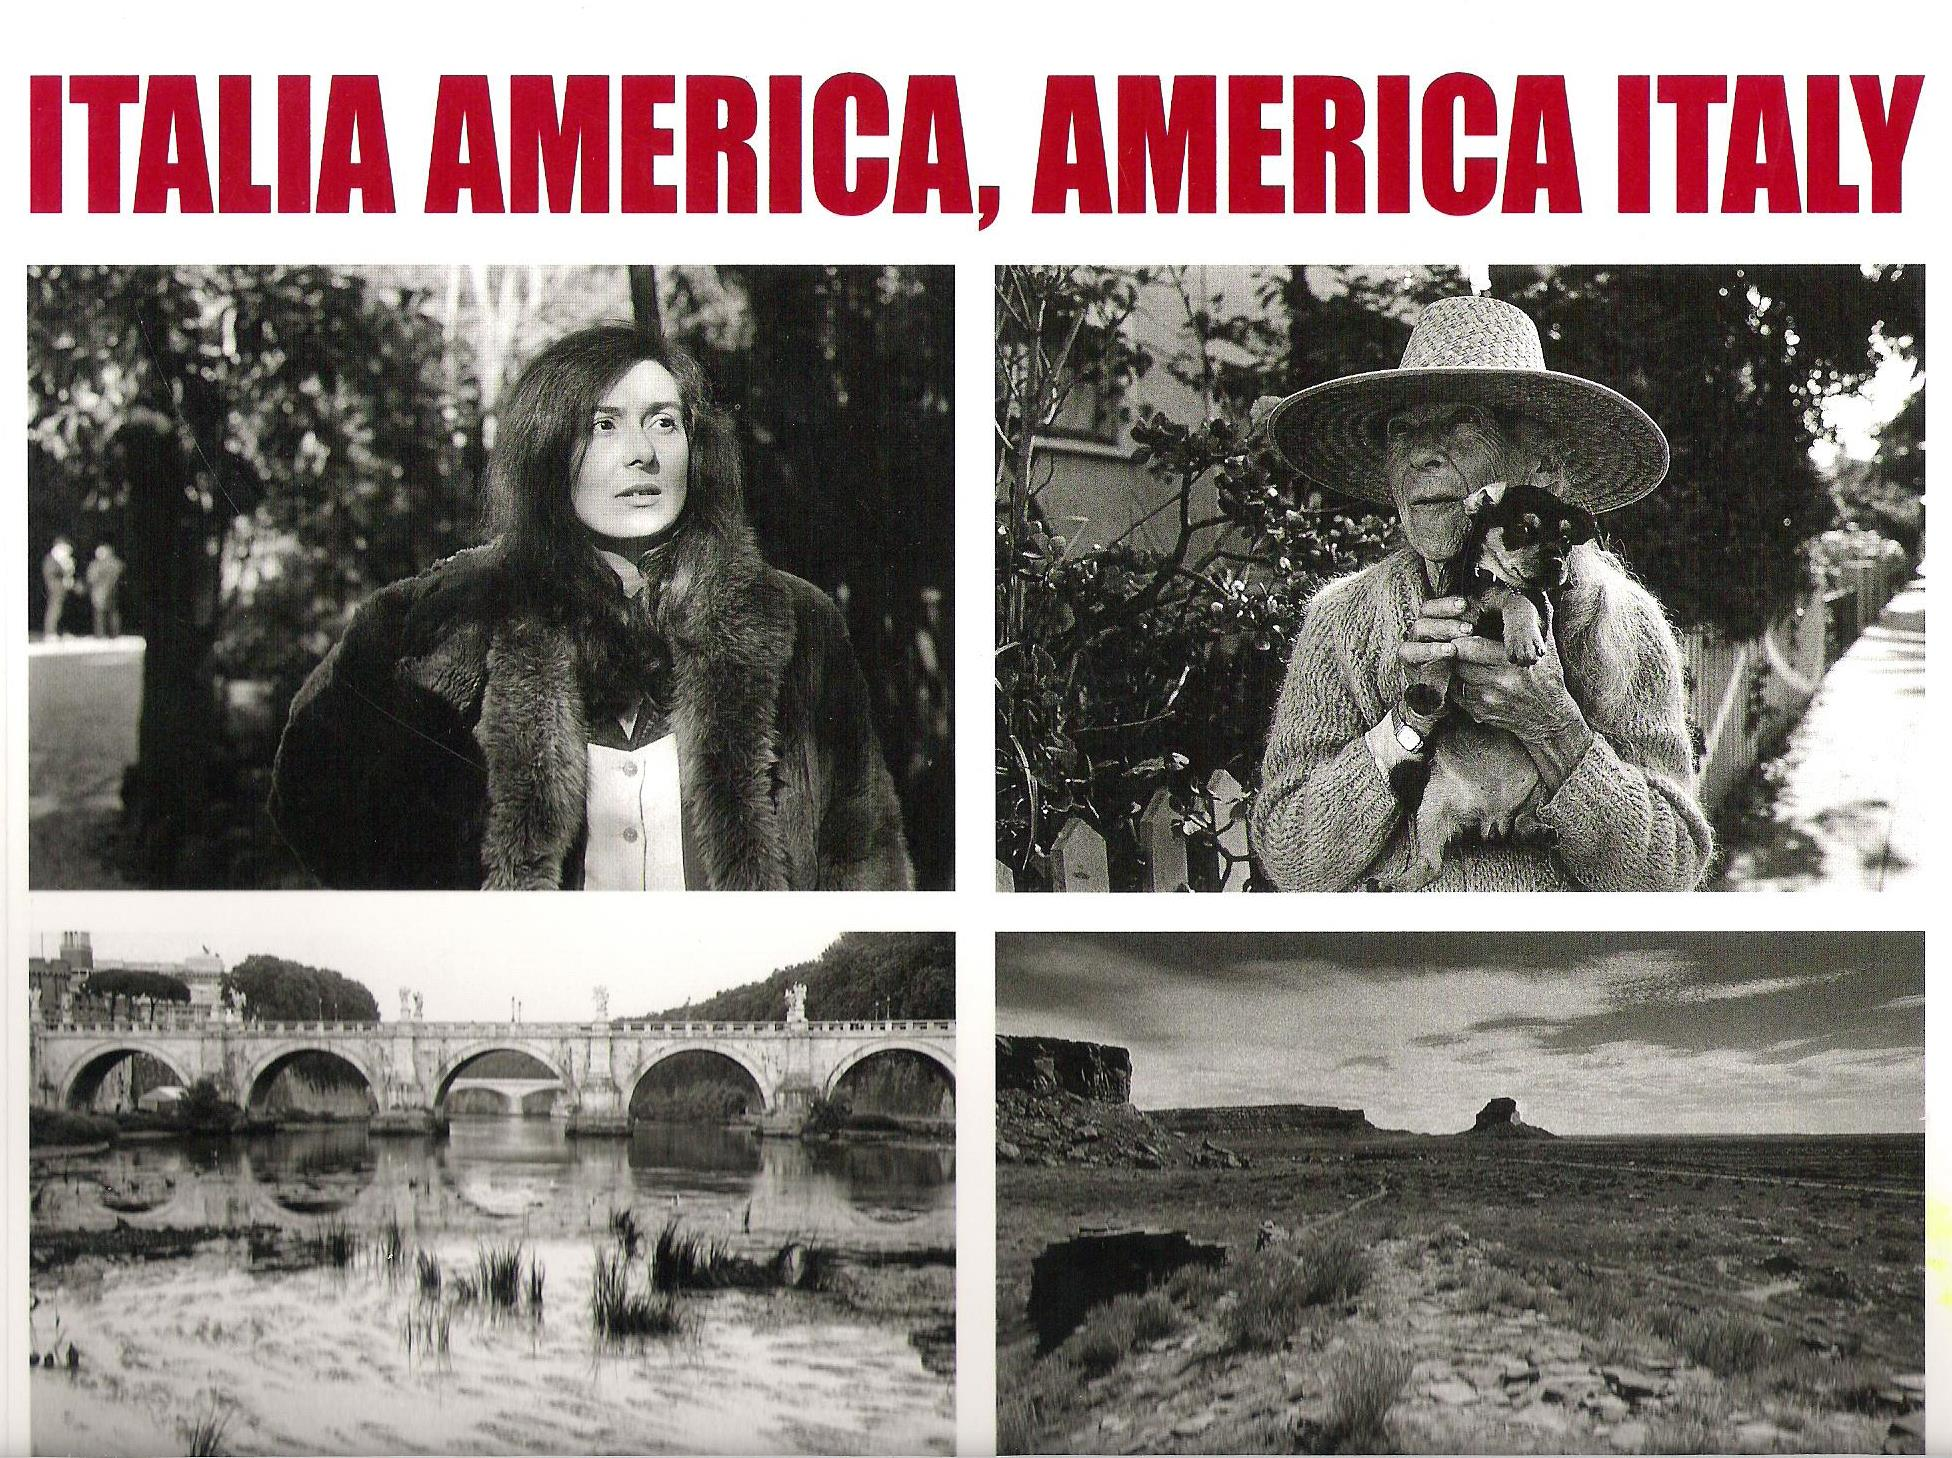 Italia America, America Italy